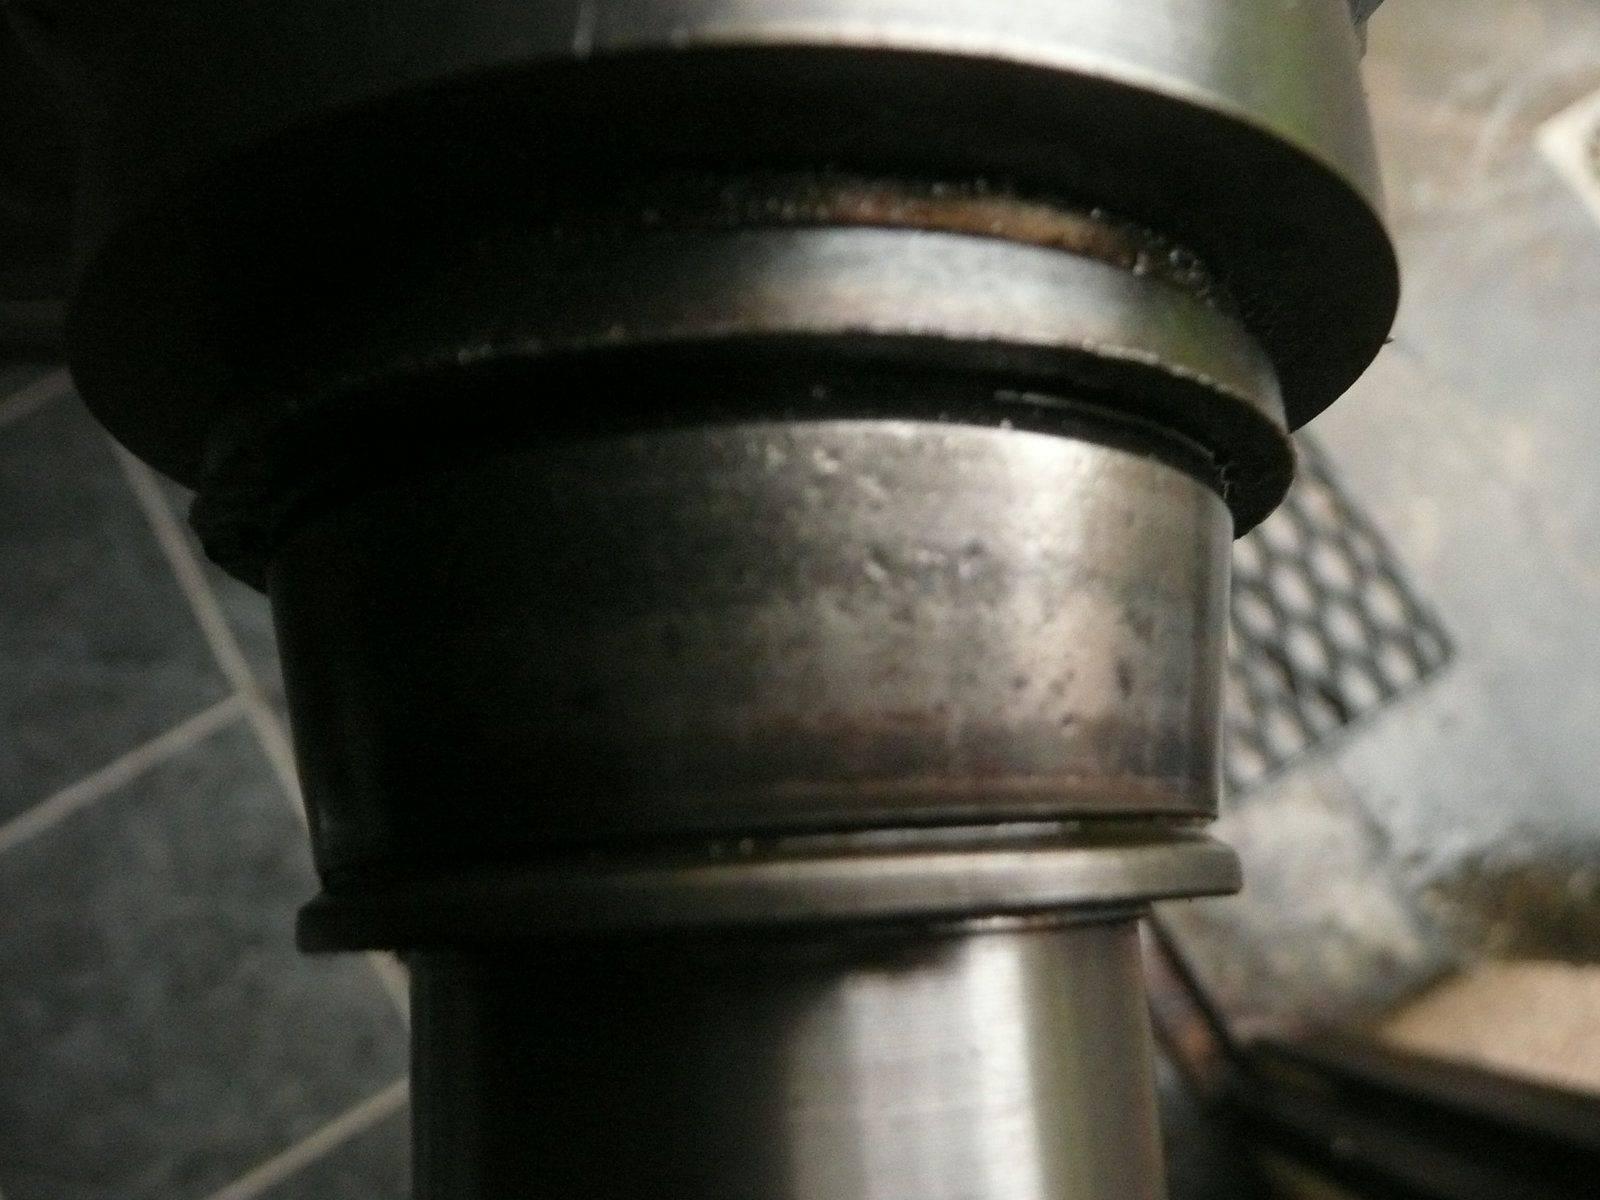 P1100960.JPG